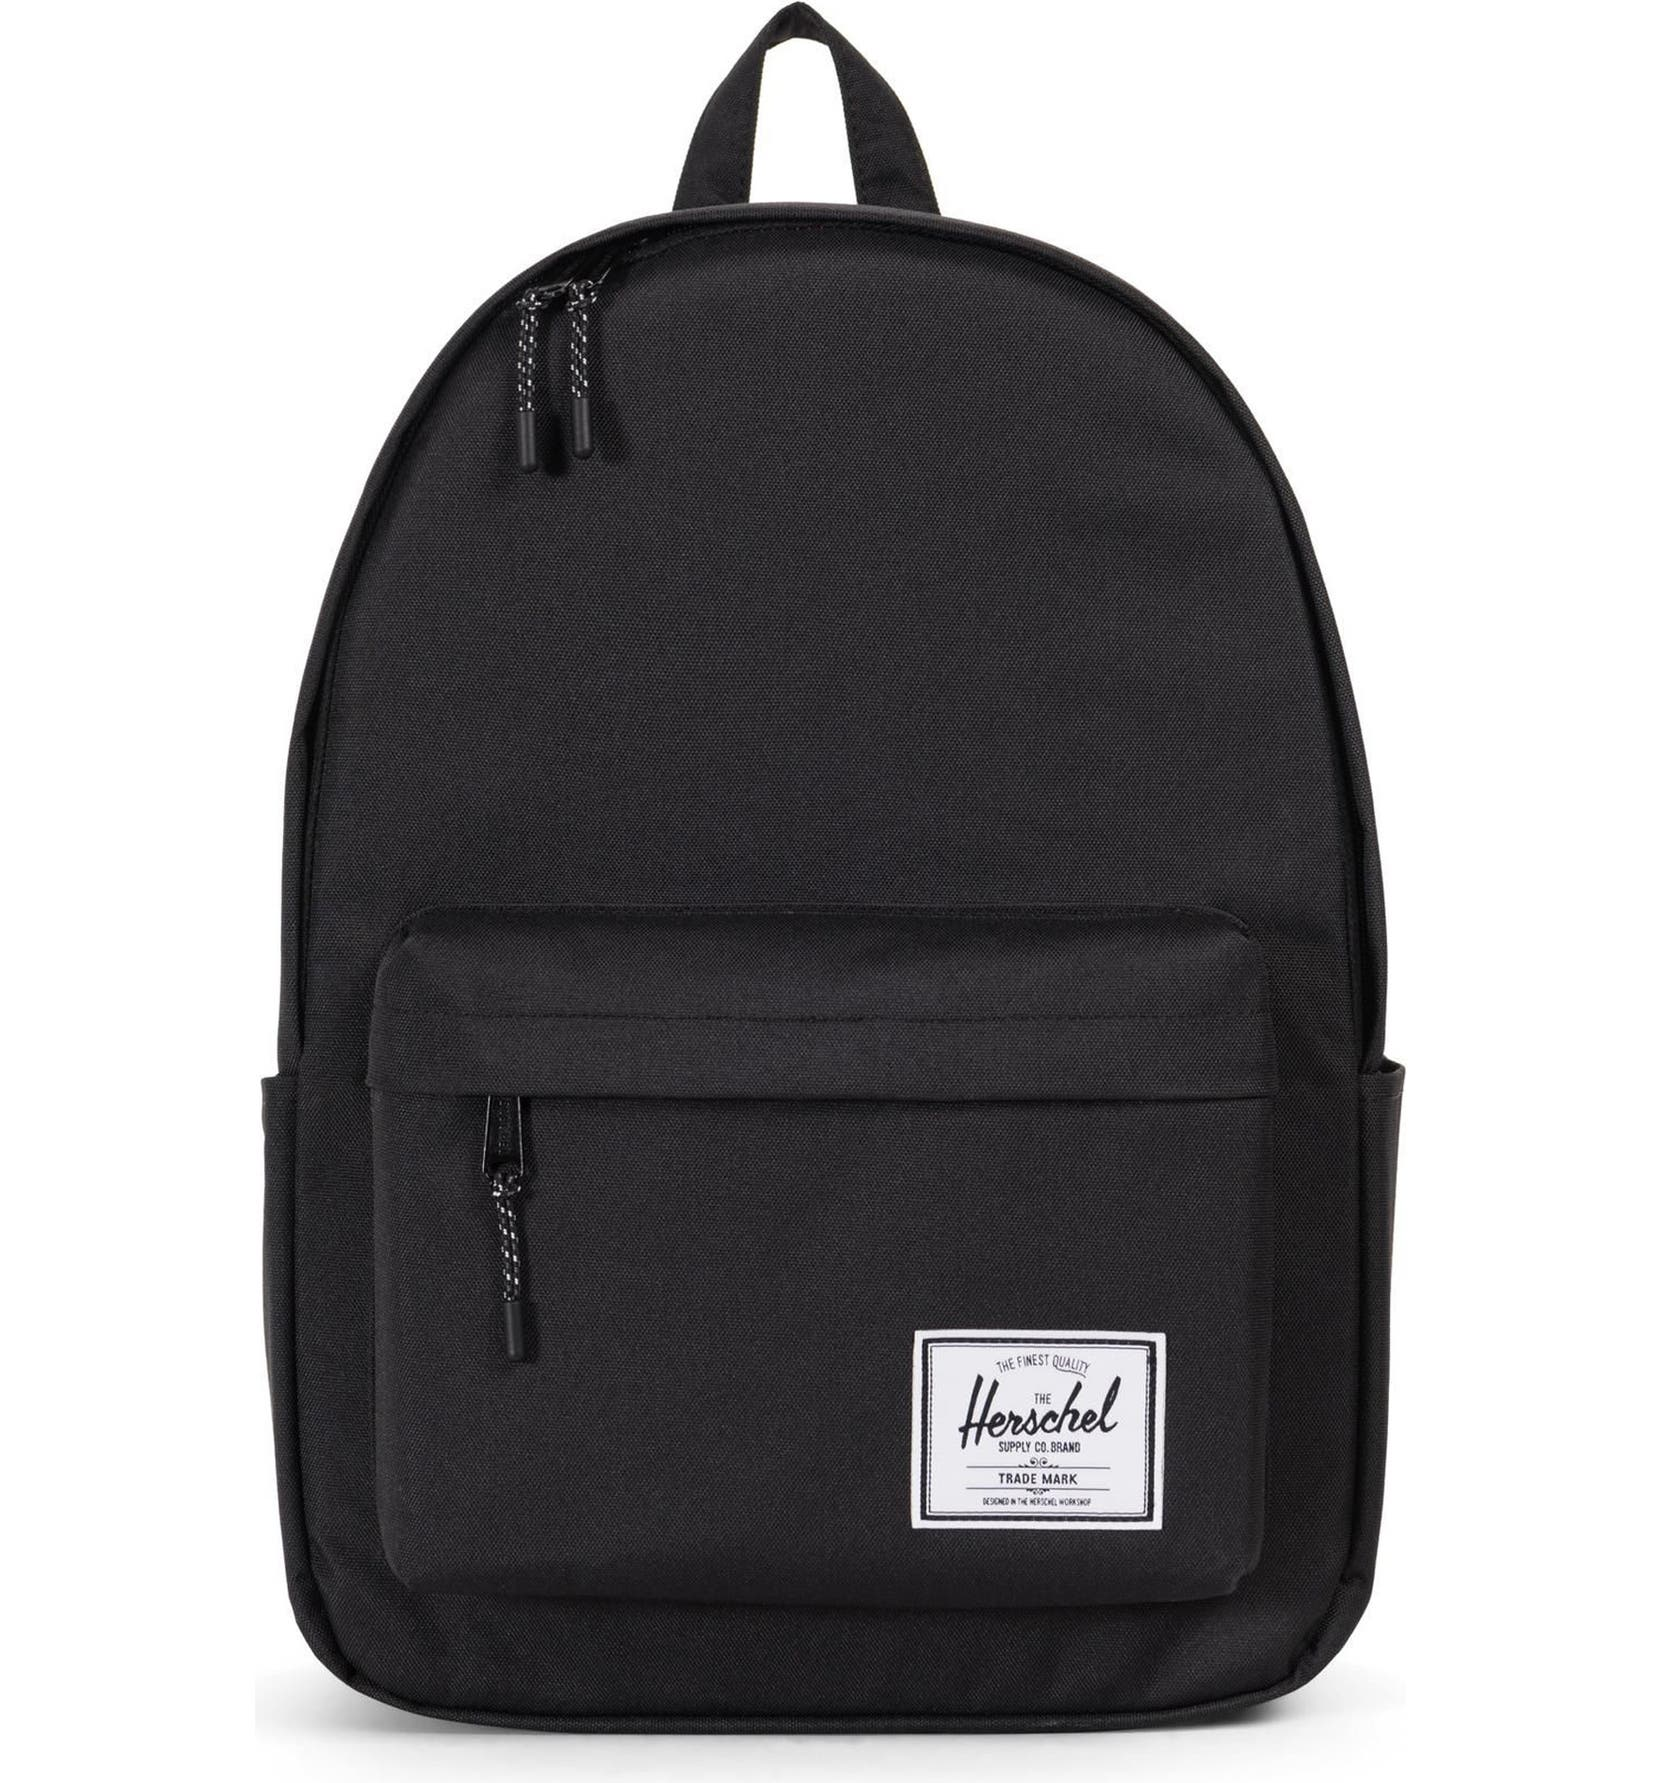 76e8d76fa29 Herschel Supply Co. Classic XL Backpack